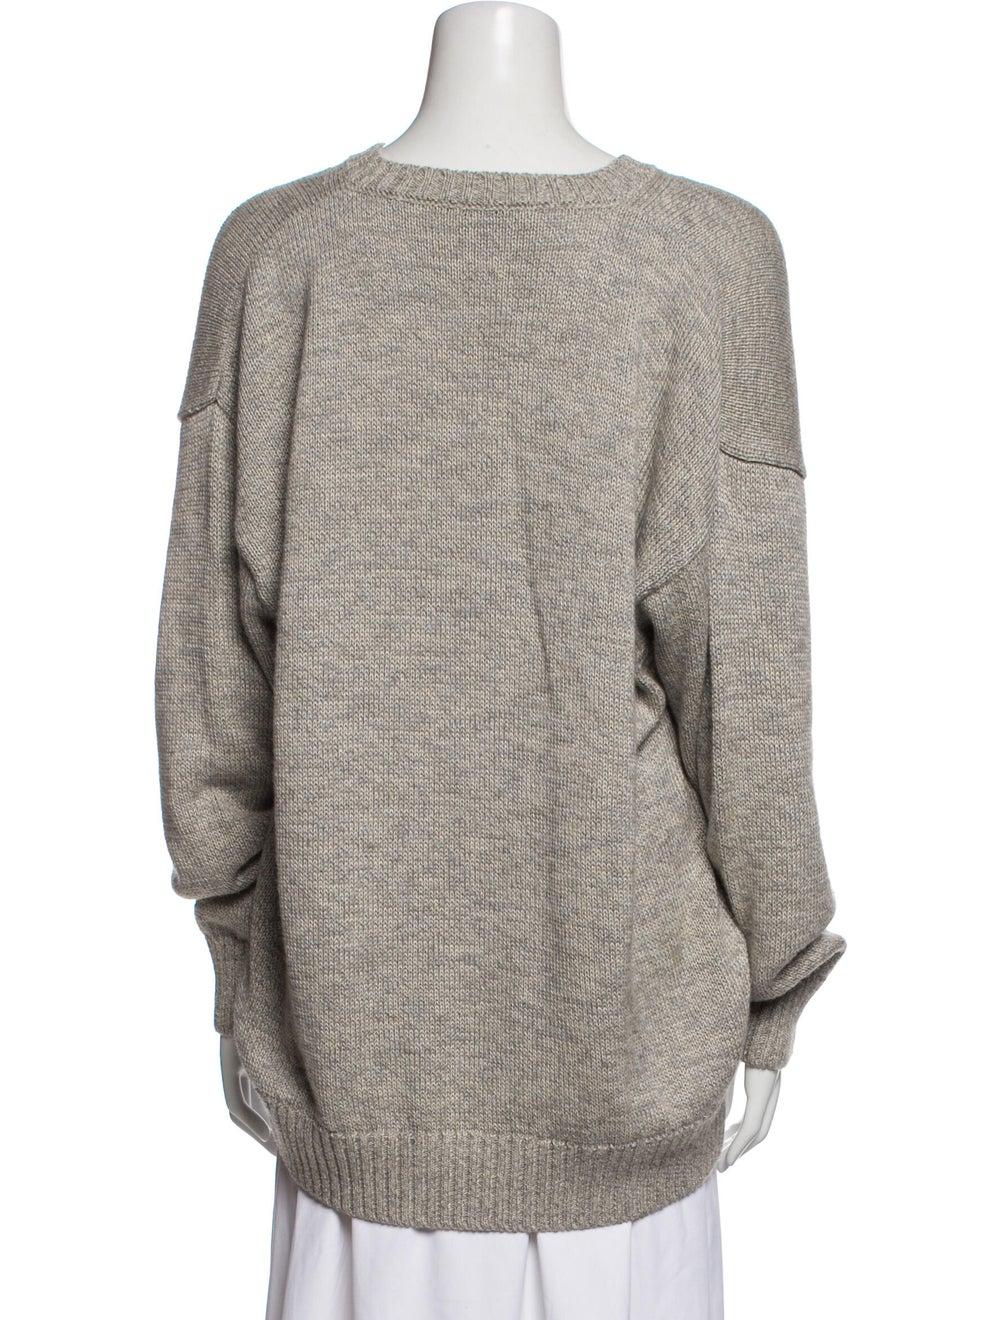 Inis Meáin V-Neck Sweater Grey - image 3